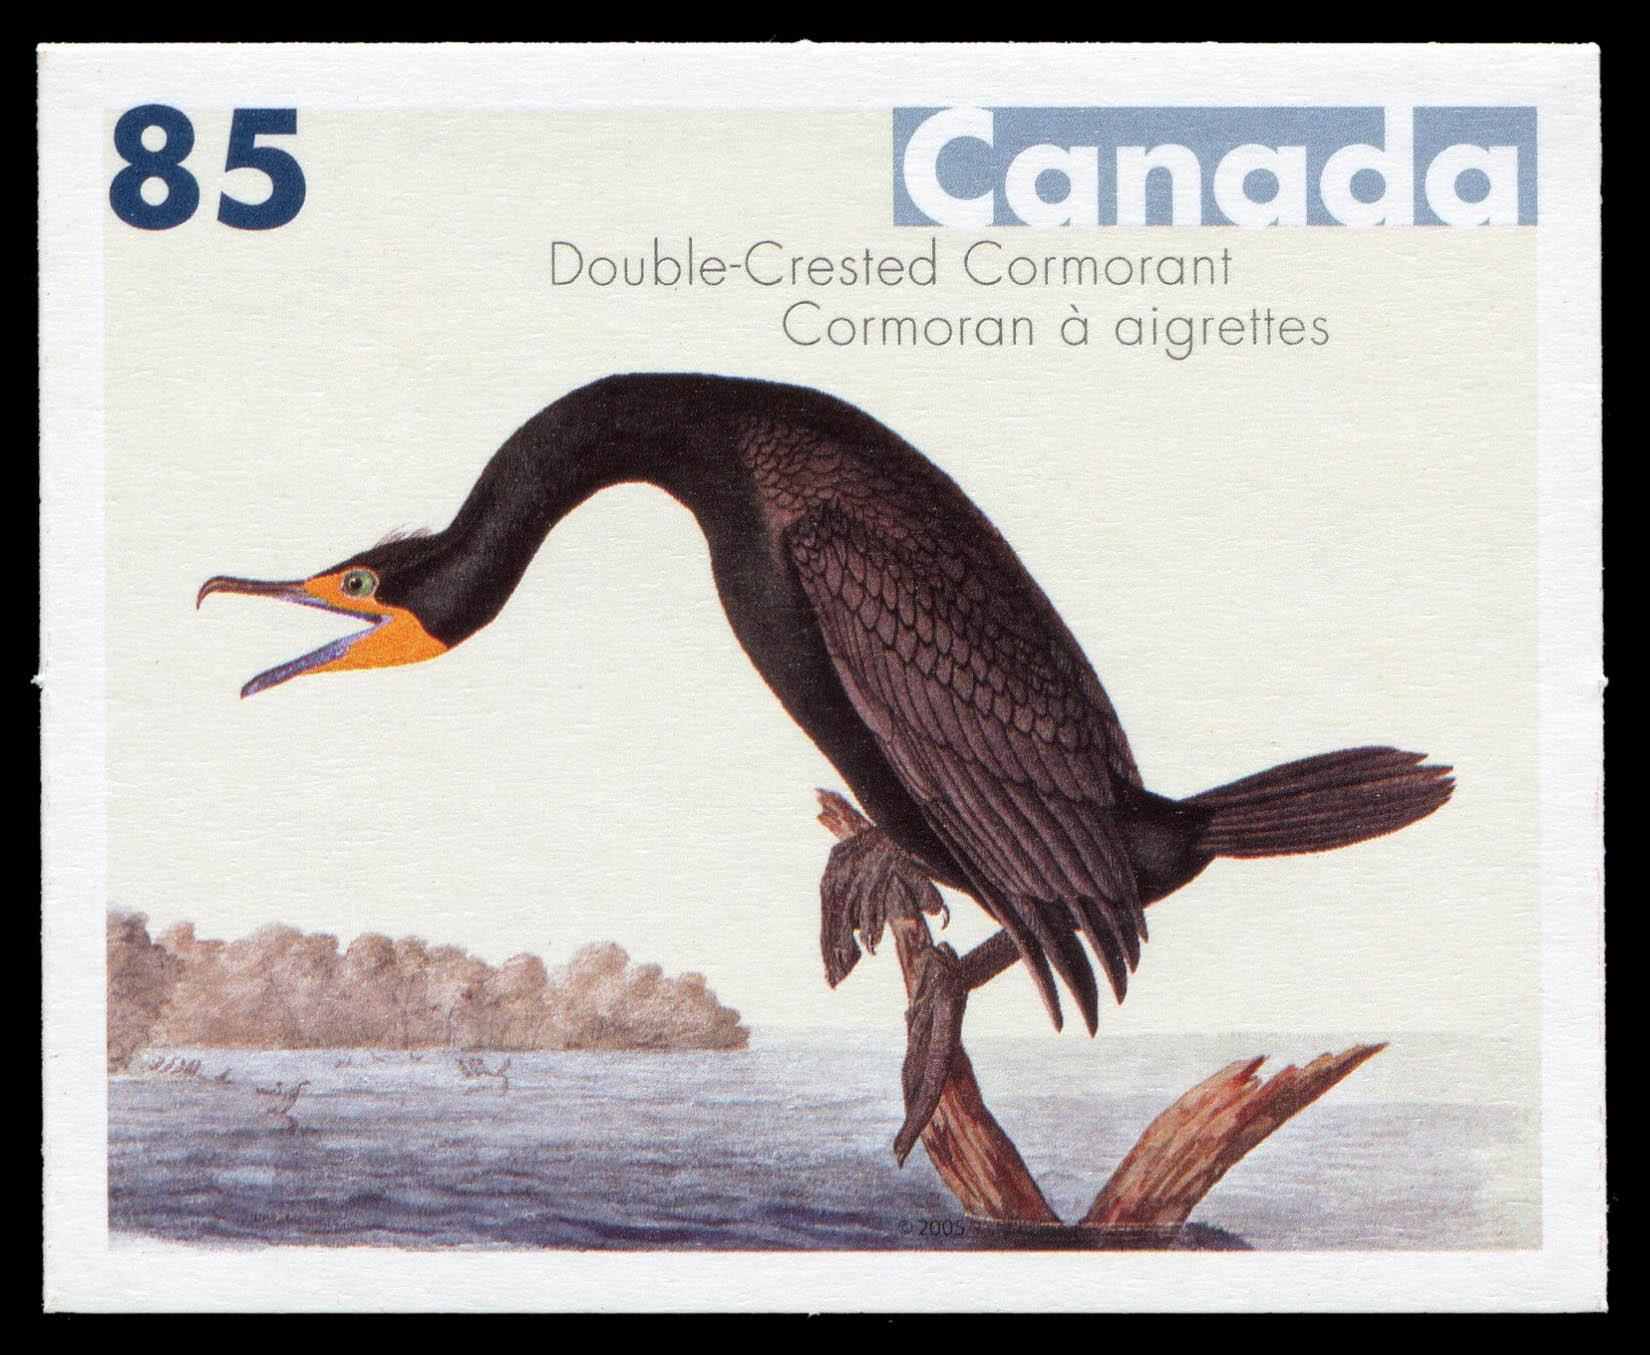 Double-Crested Cormorant Canada Postage Stamp | John James Audubon's Birds